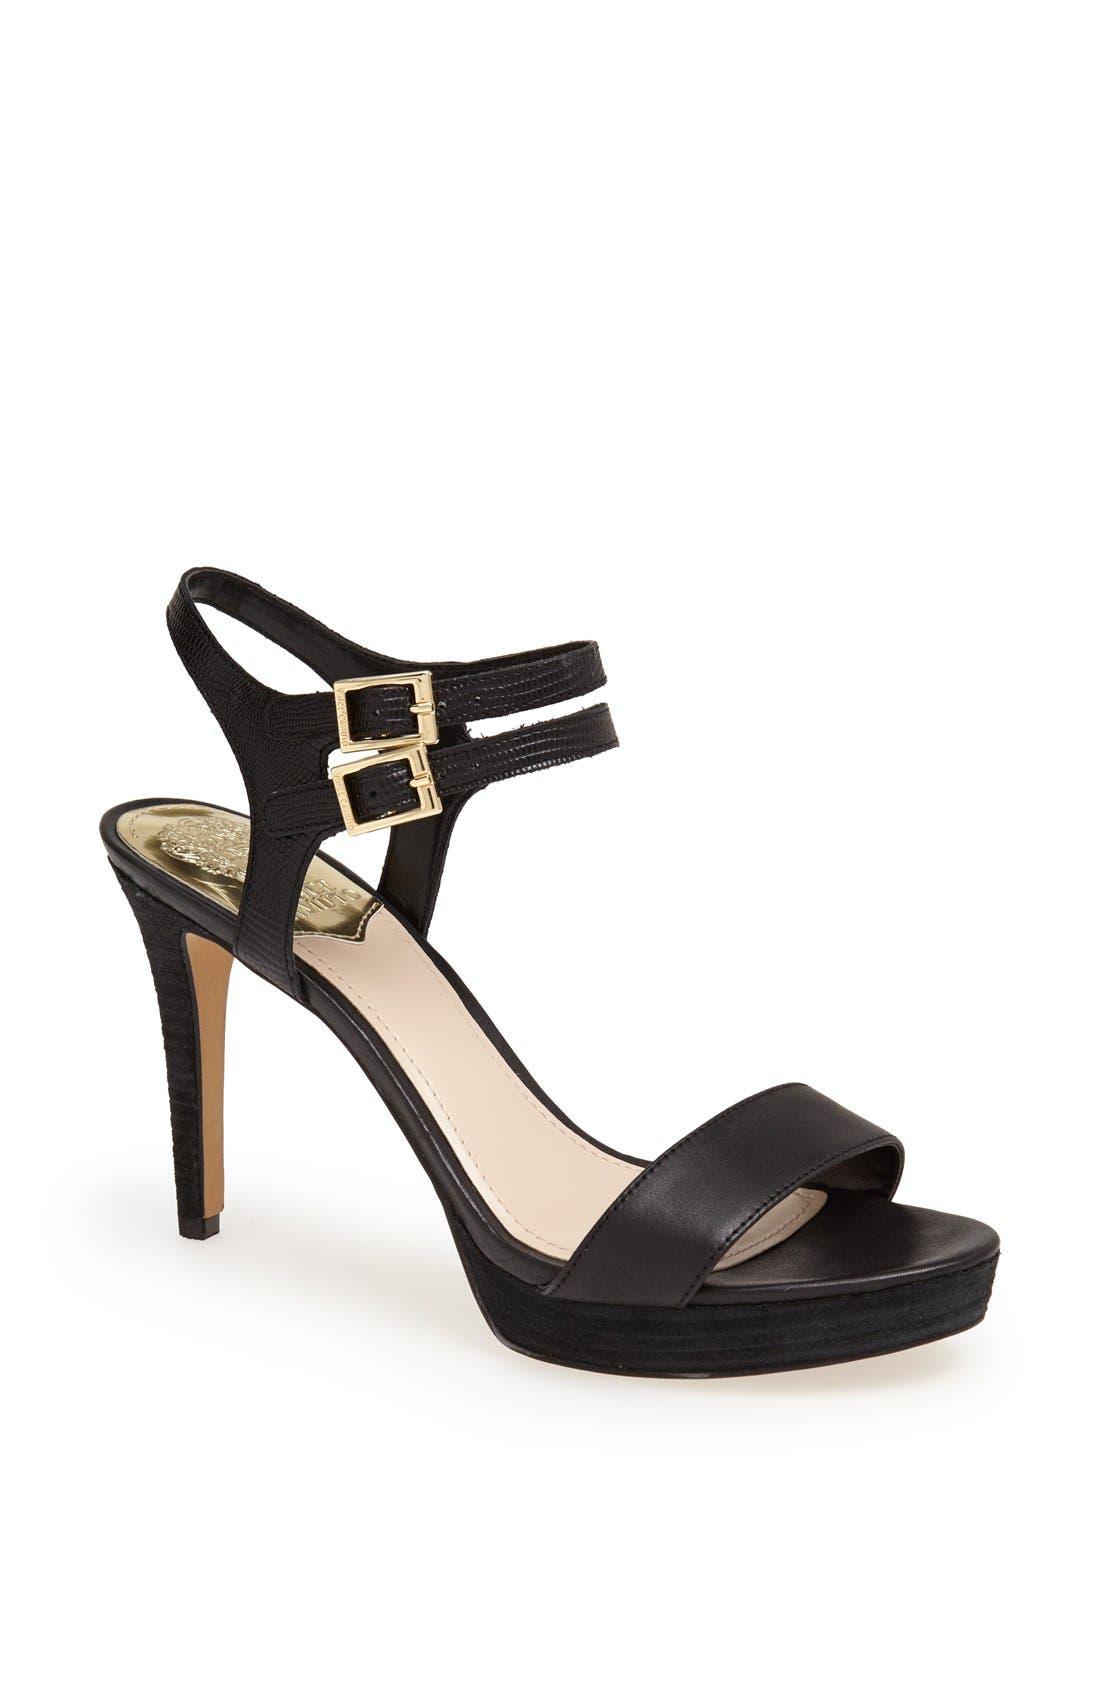 Main Image - Vince Camuto 'Renalla' Sandal